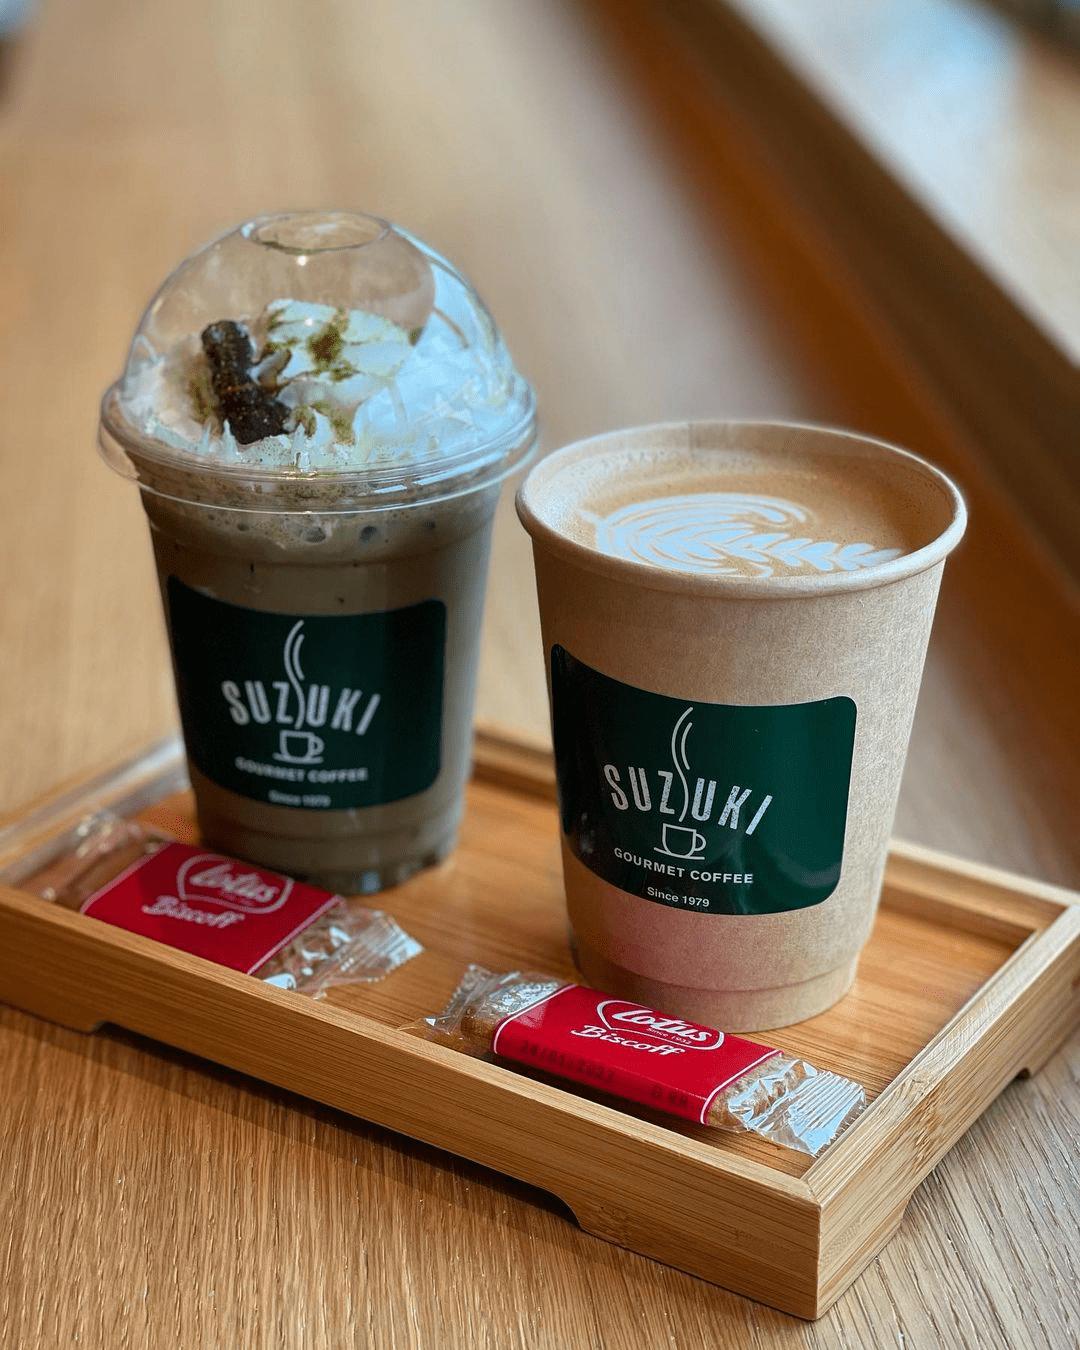 New Cafes And Restaurants June 2021 - Suzuki Gourmet Cafe